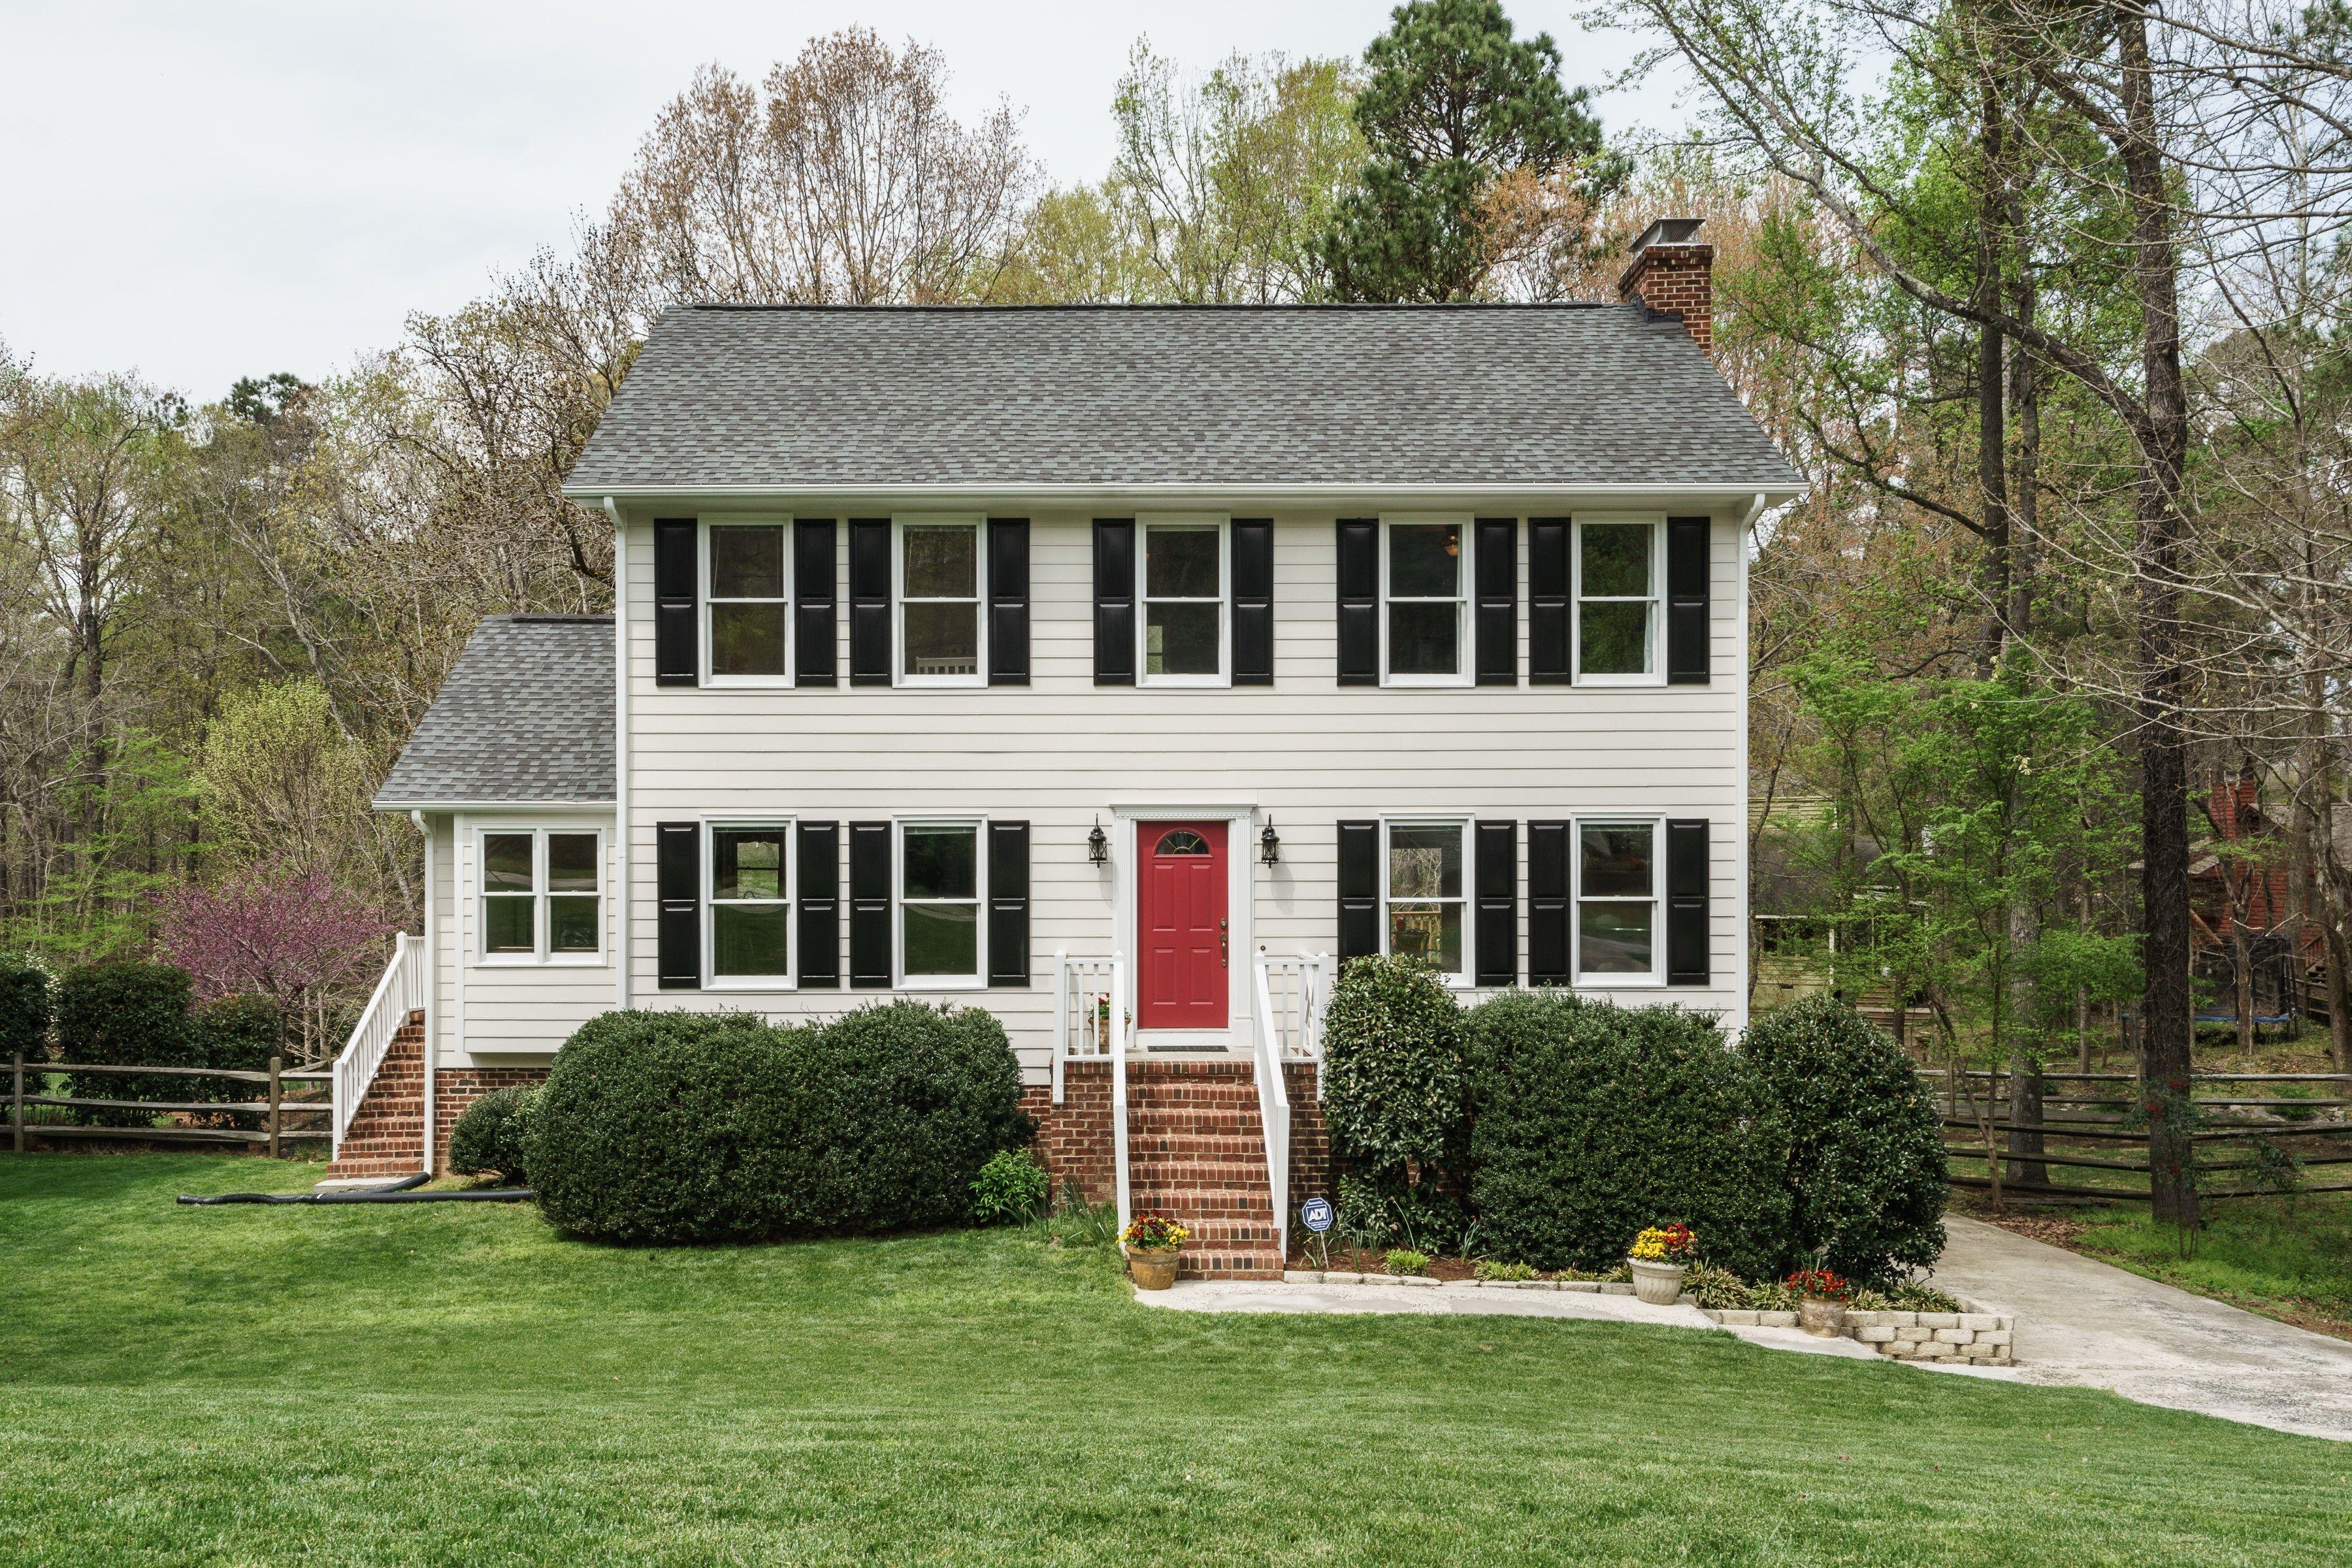 Sold 5 Saddlewood Woodcroft Durham House Styles Outdoor Decor House